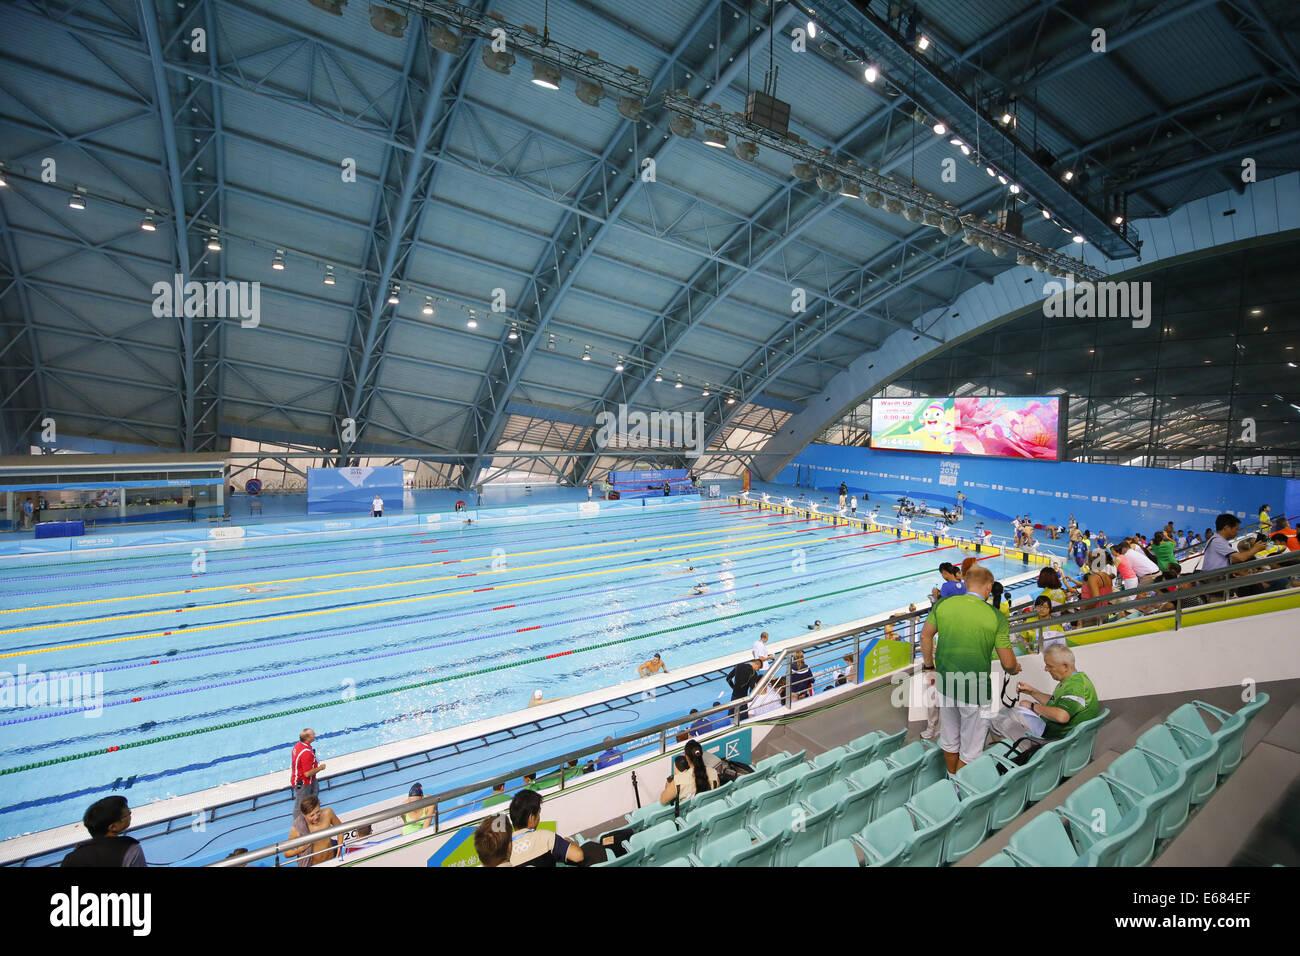 Nanjing, China. 18th Aug, 2014. Nanjing Olympic Sports Center Natatorium, August 18, 2014 - Swimming : Nanjing Olympic - Stock Image